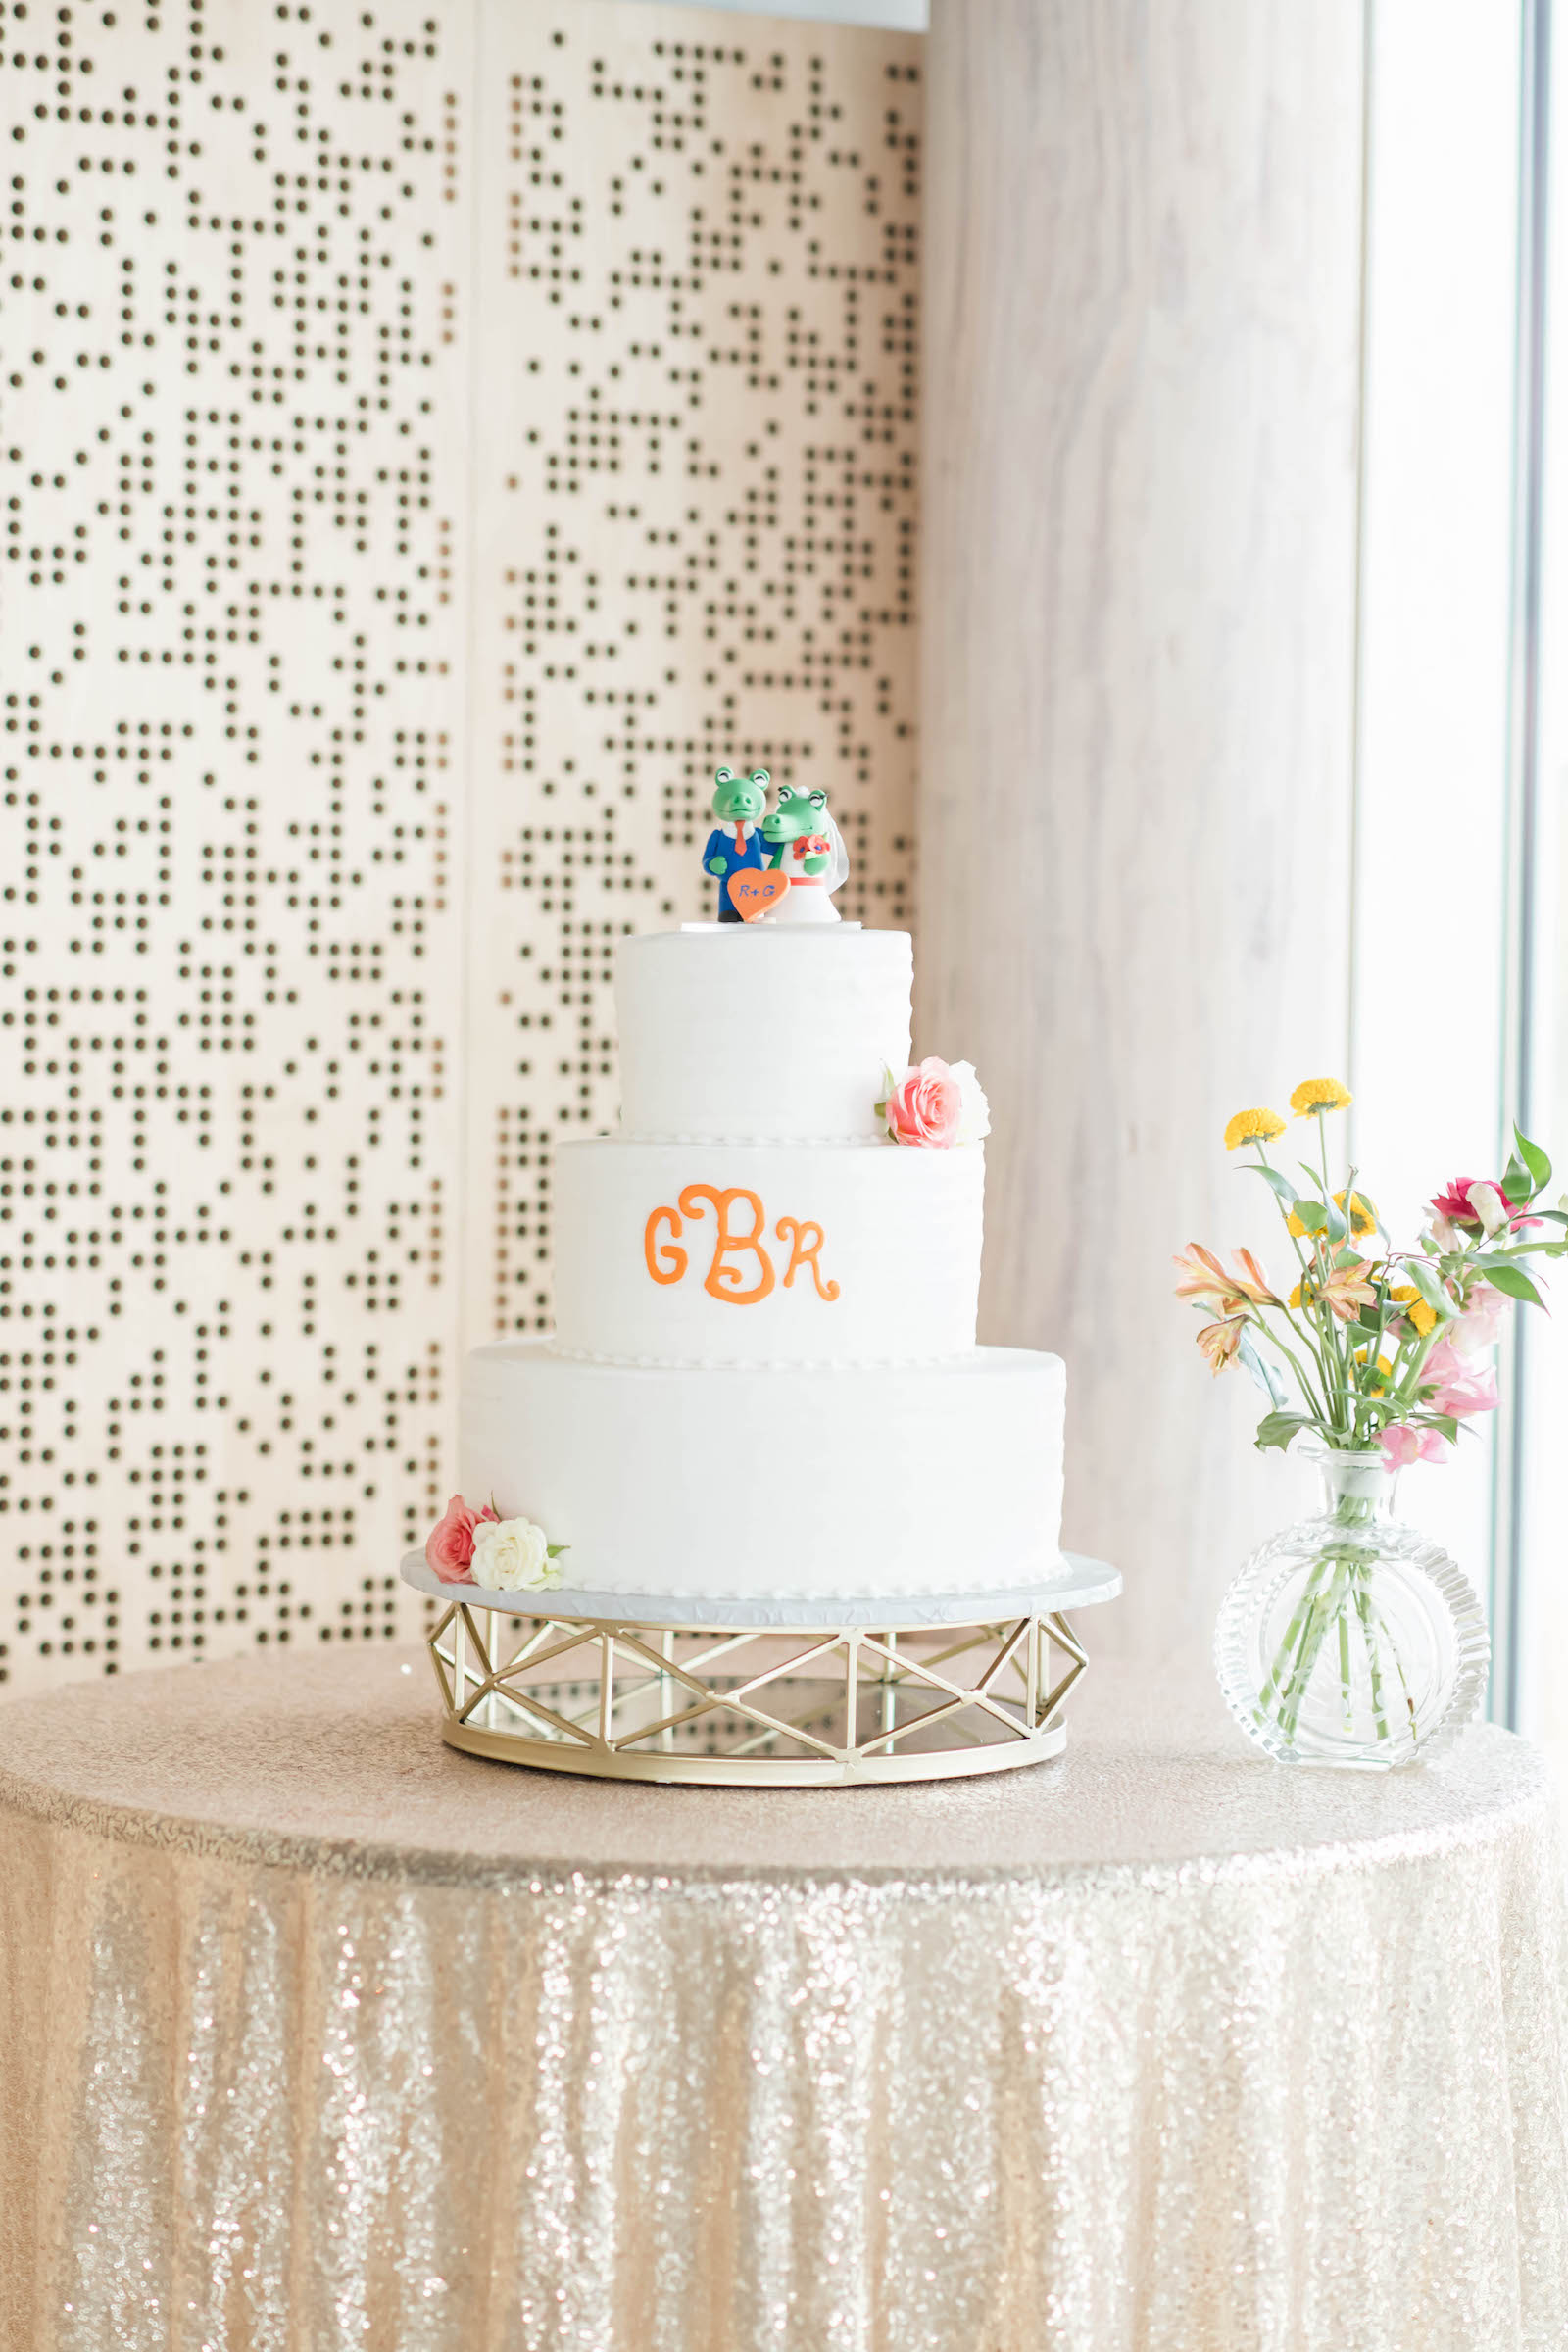 Three Tier White Wedding Cake with Orange Monogram Initials, University of Florida Gators Cake Topper